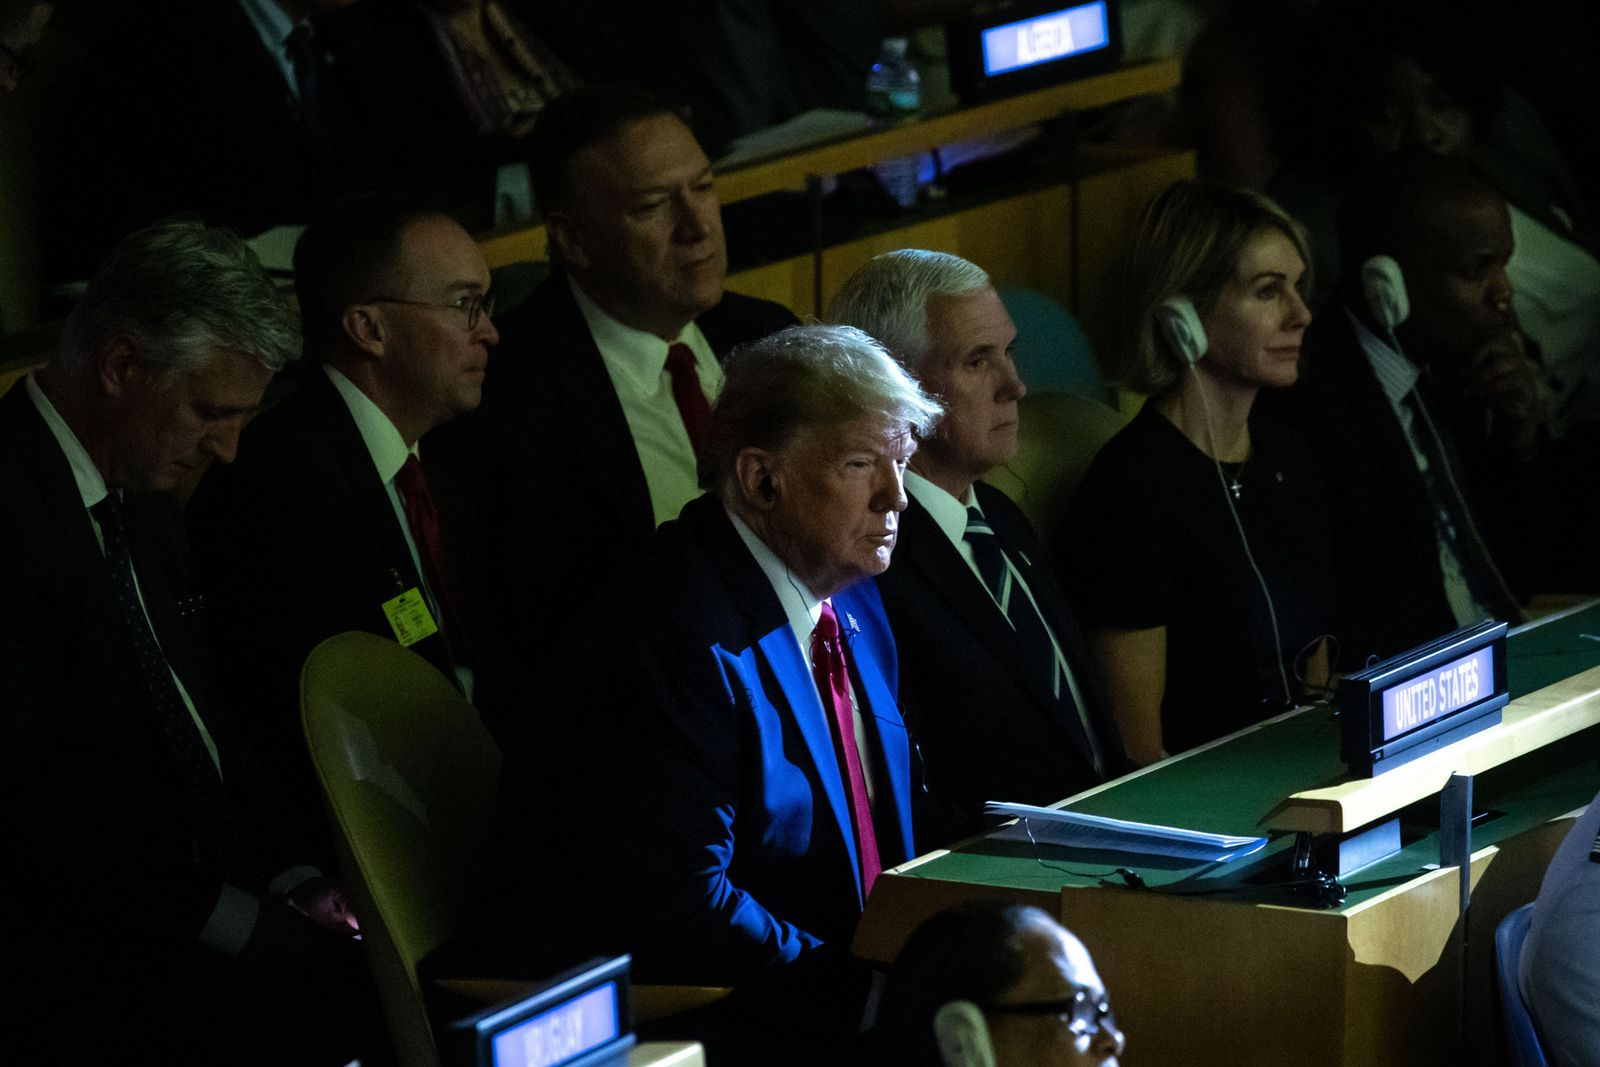 Donald Trump / Klimagipfel